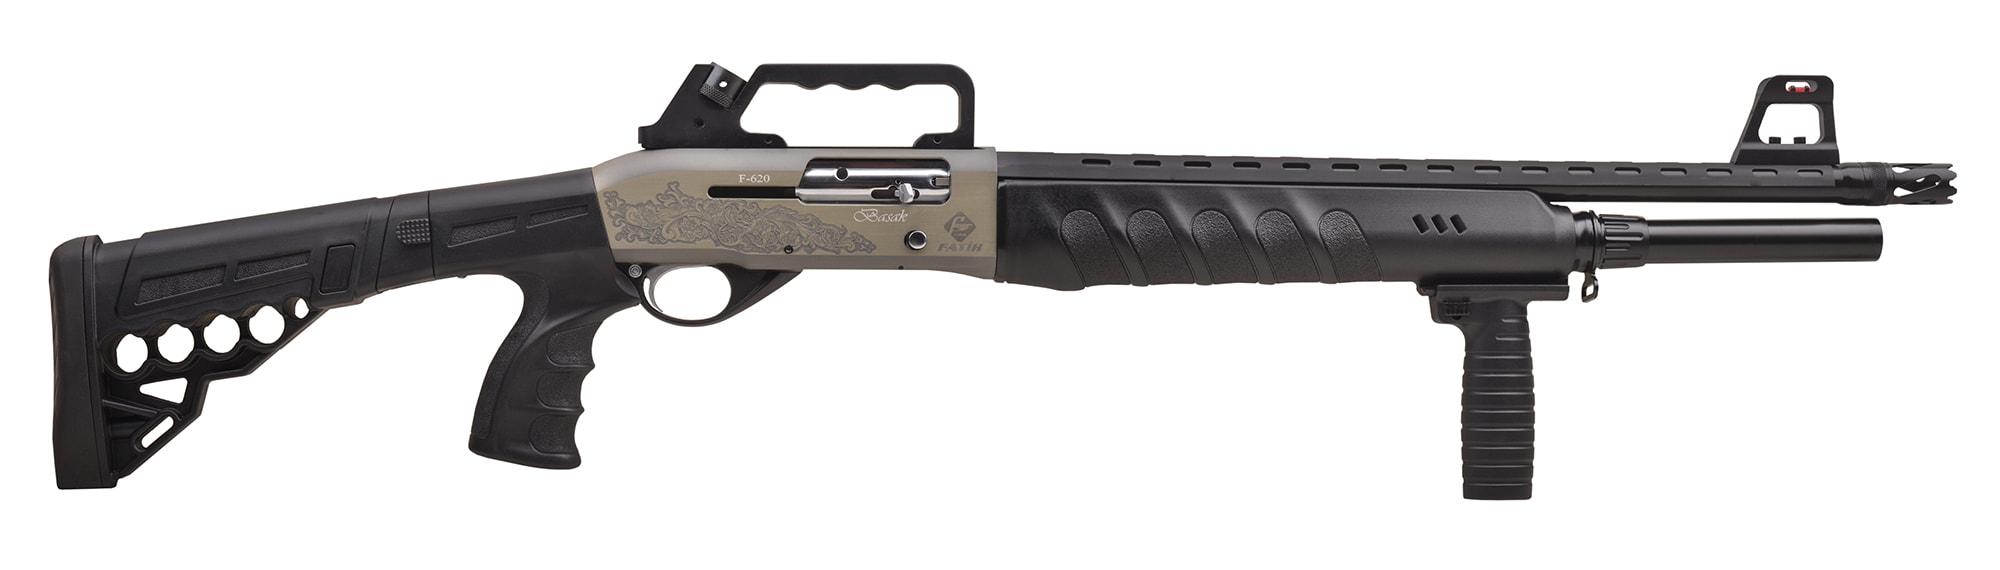 Basak F620 Smoked Tactical